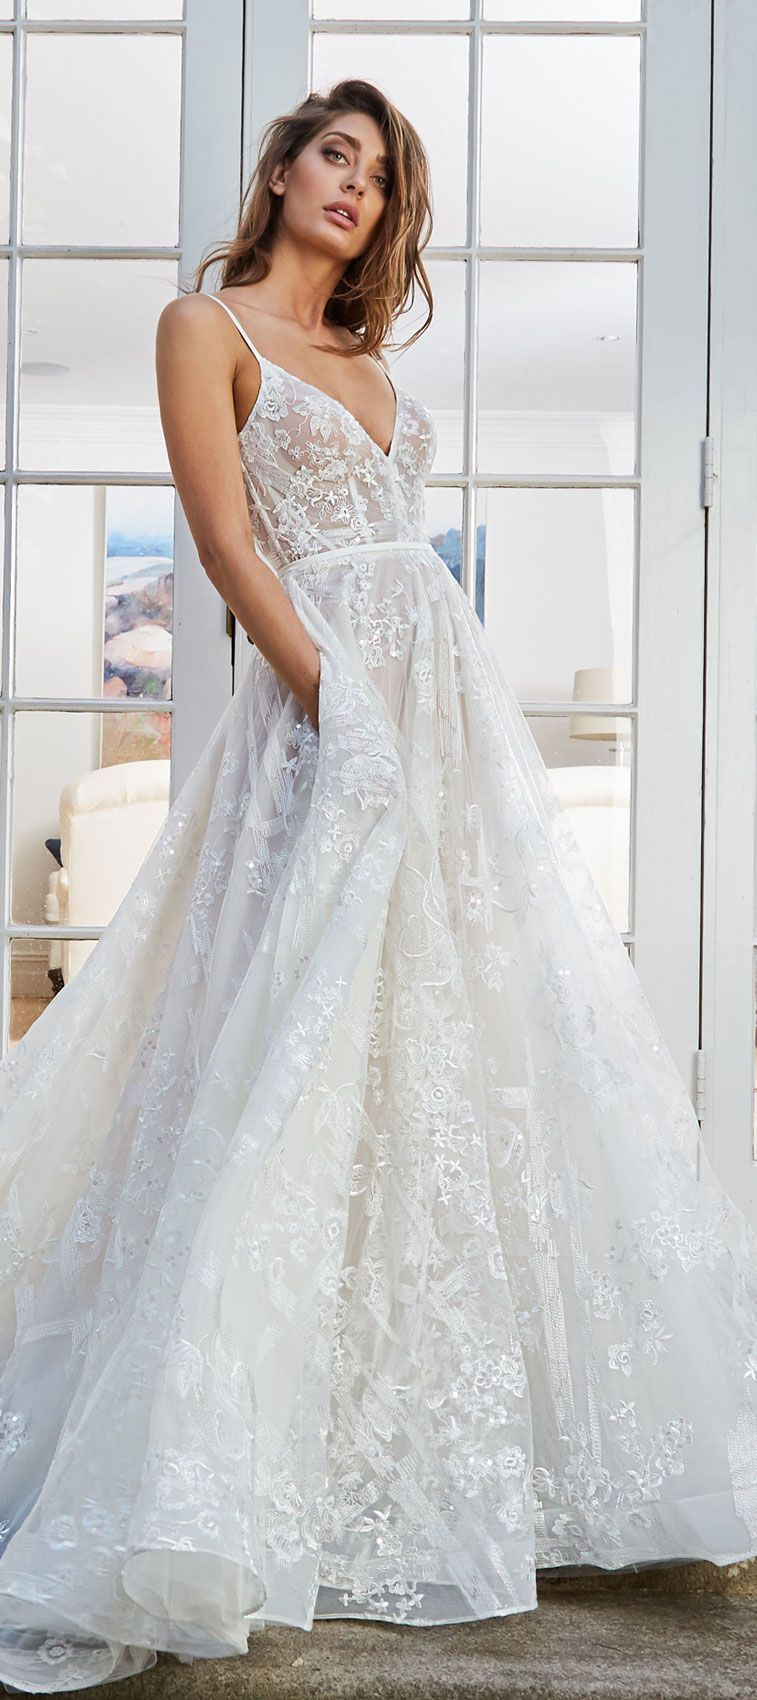 Leah Da Gloria Made To Order Wedding Gowns | Pocket detail, Chapel ...